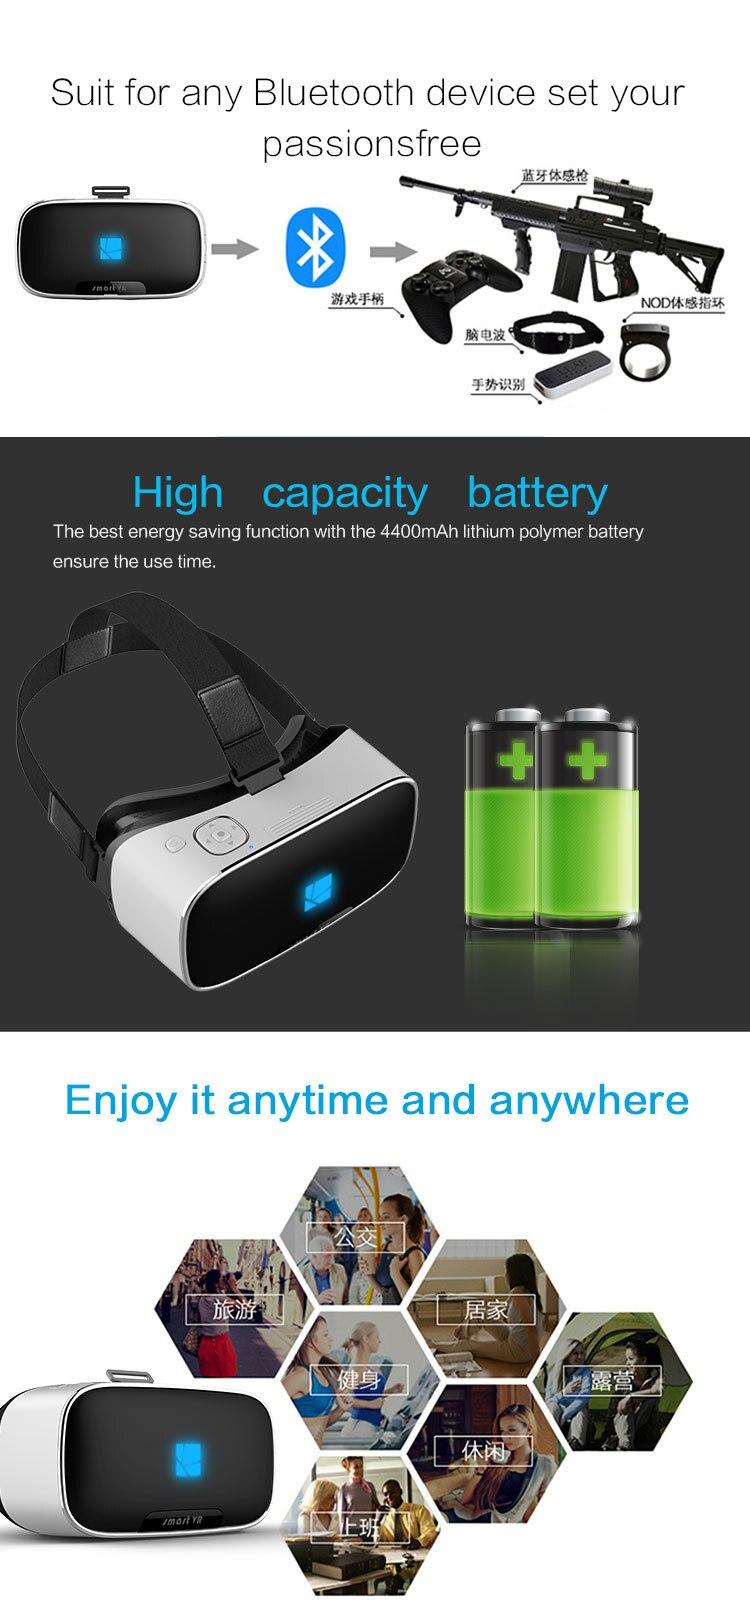 V1 VR Glasses Helmet 3D All in One VR BOX 2K Full HD LCD Screen Display Panorama 360 Degree Headset Game Virtual Reality Glasses